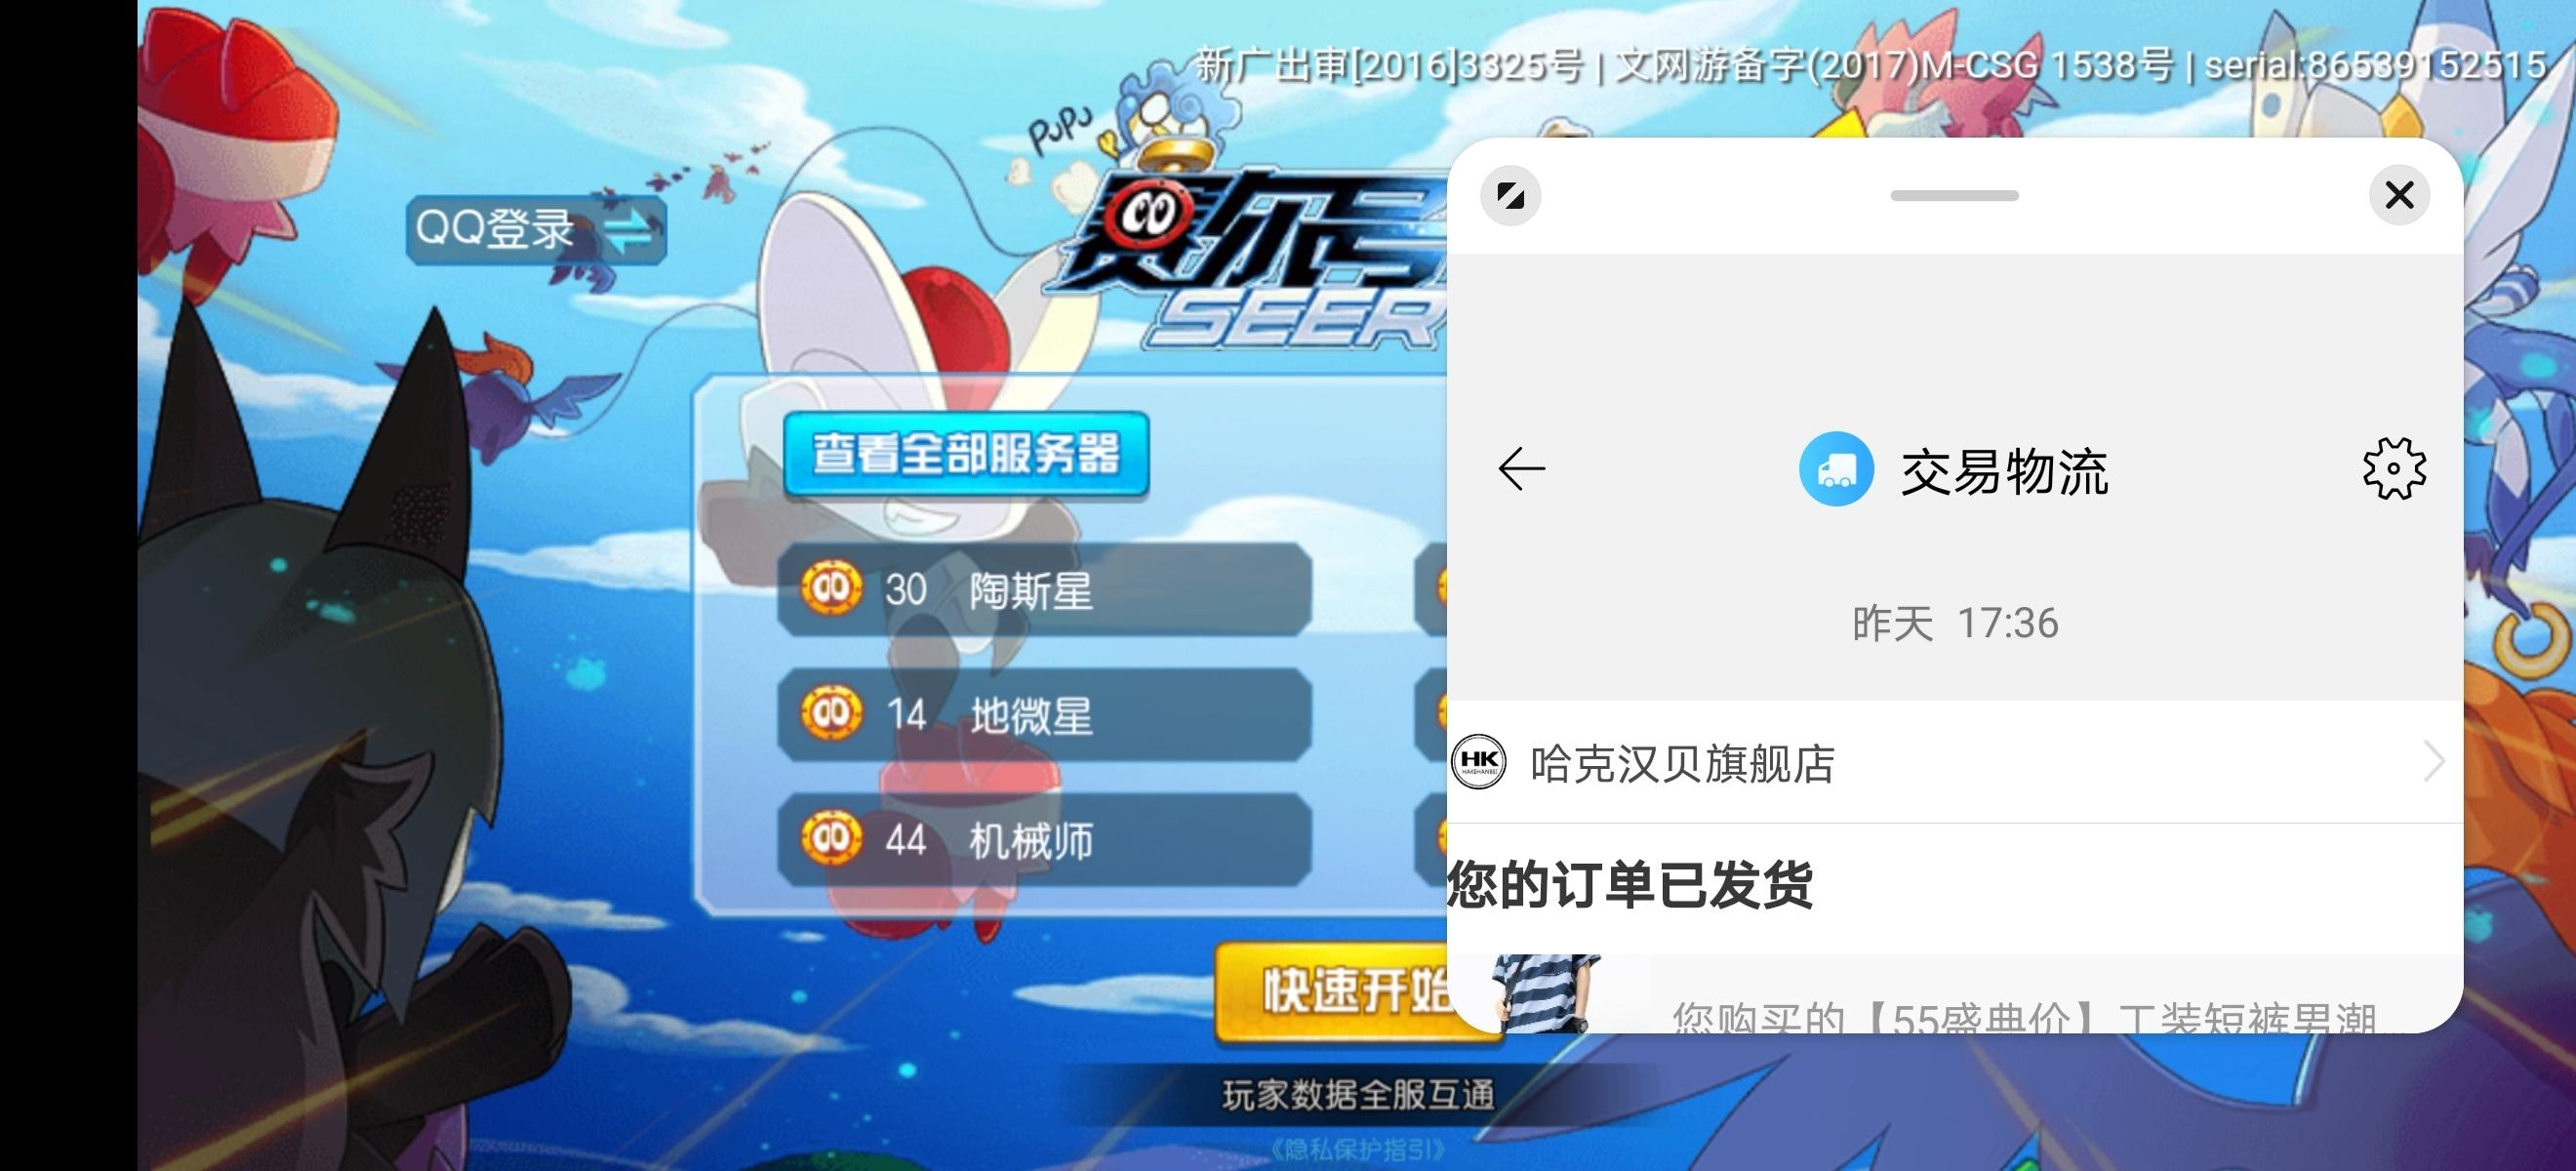 Screenshot_20200509_202158_com.taobao.taobao.jpg